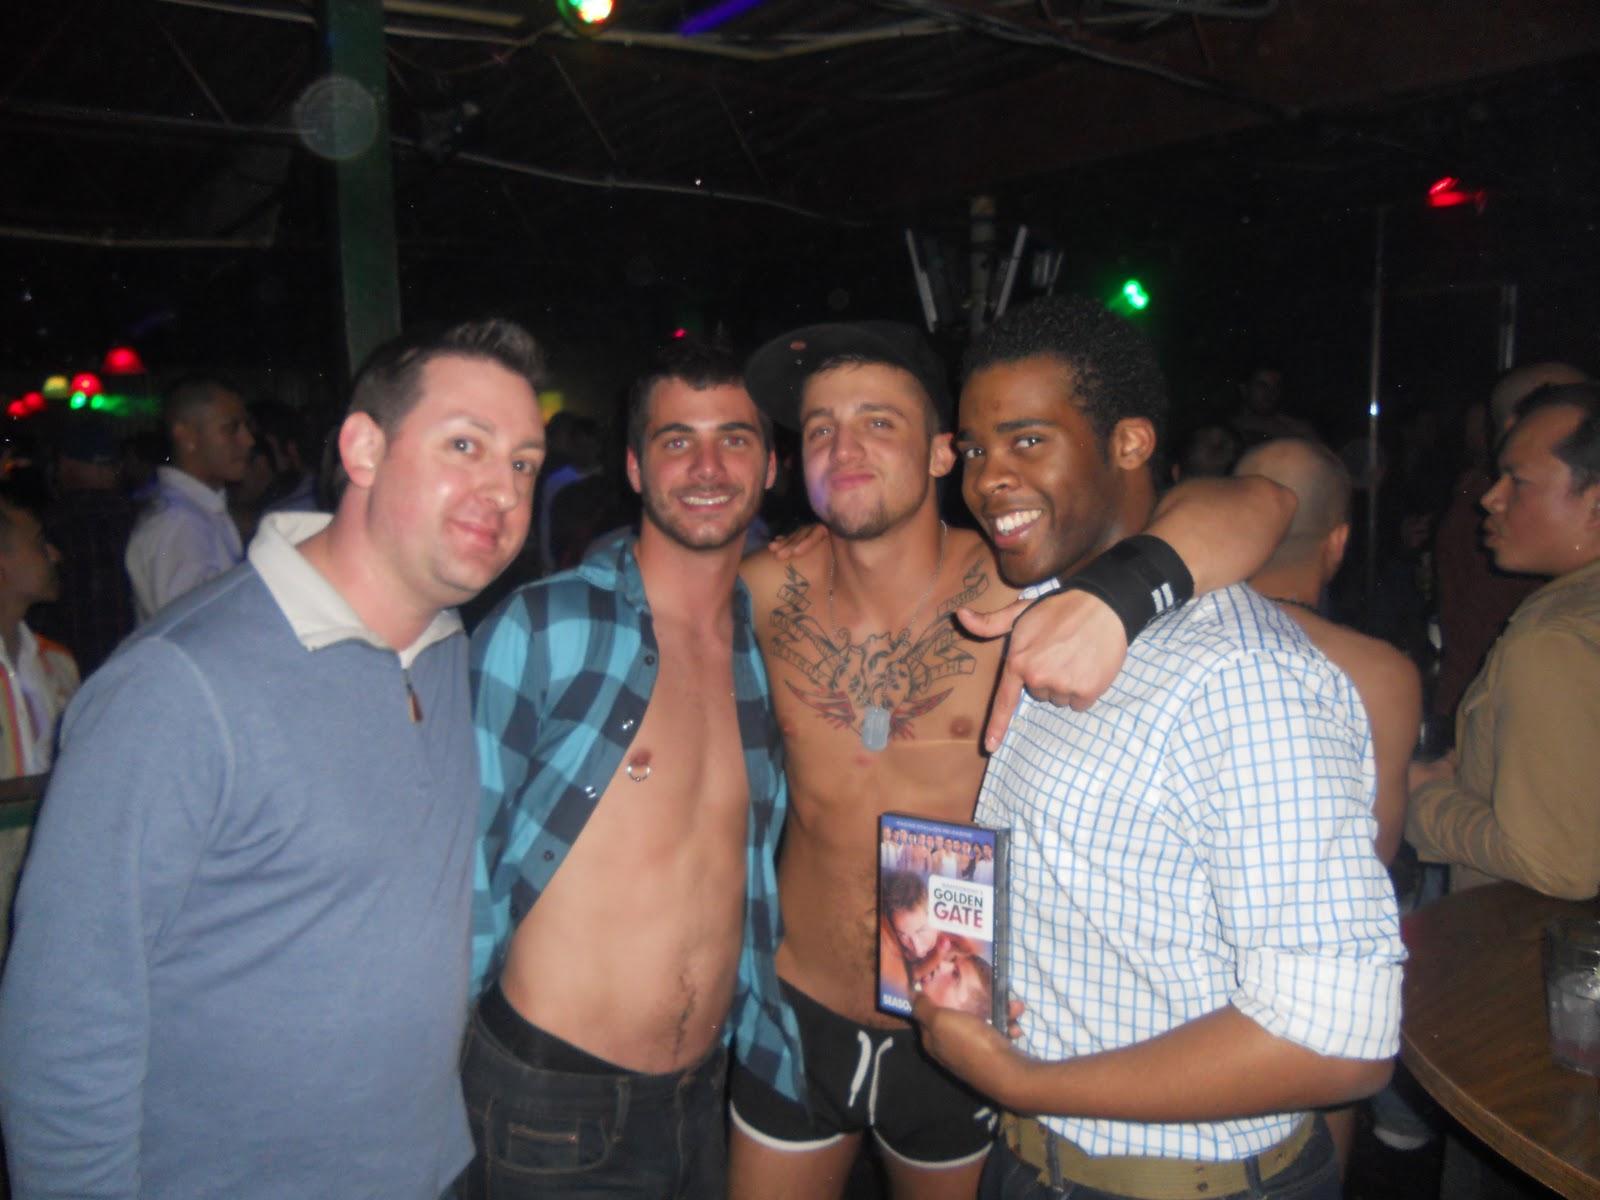 Abraham Mateo Porno Gay i met samuel colt and chris porter at the tin room - gay